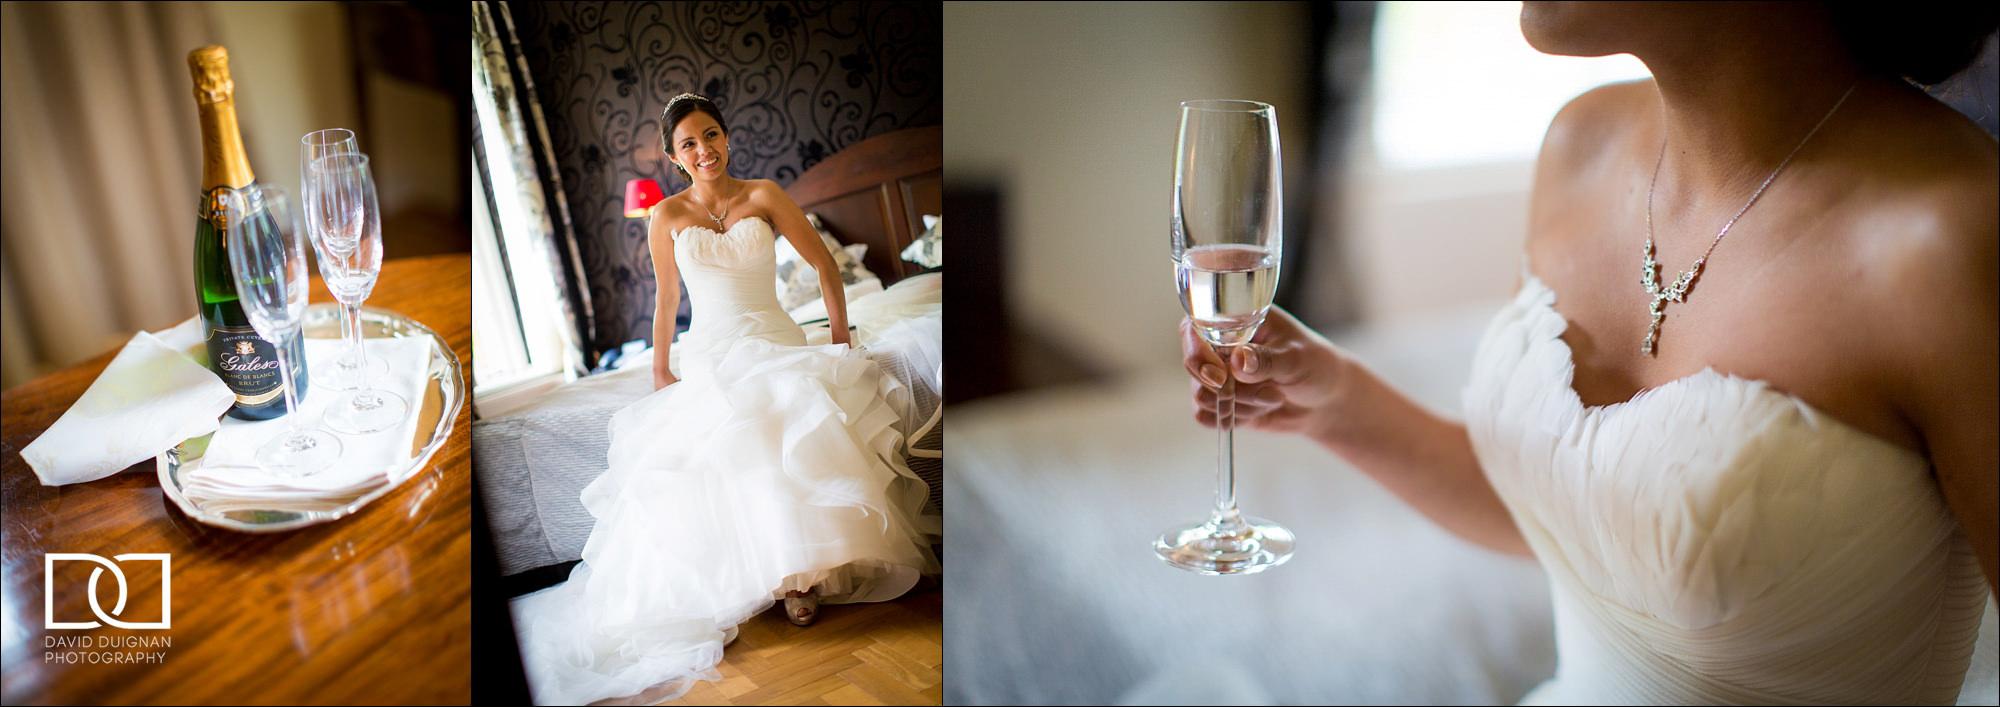 dublin wedding photographer david duignan photography wedding photos 0012